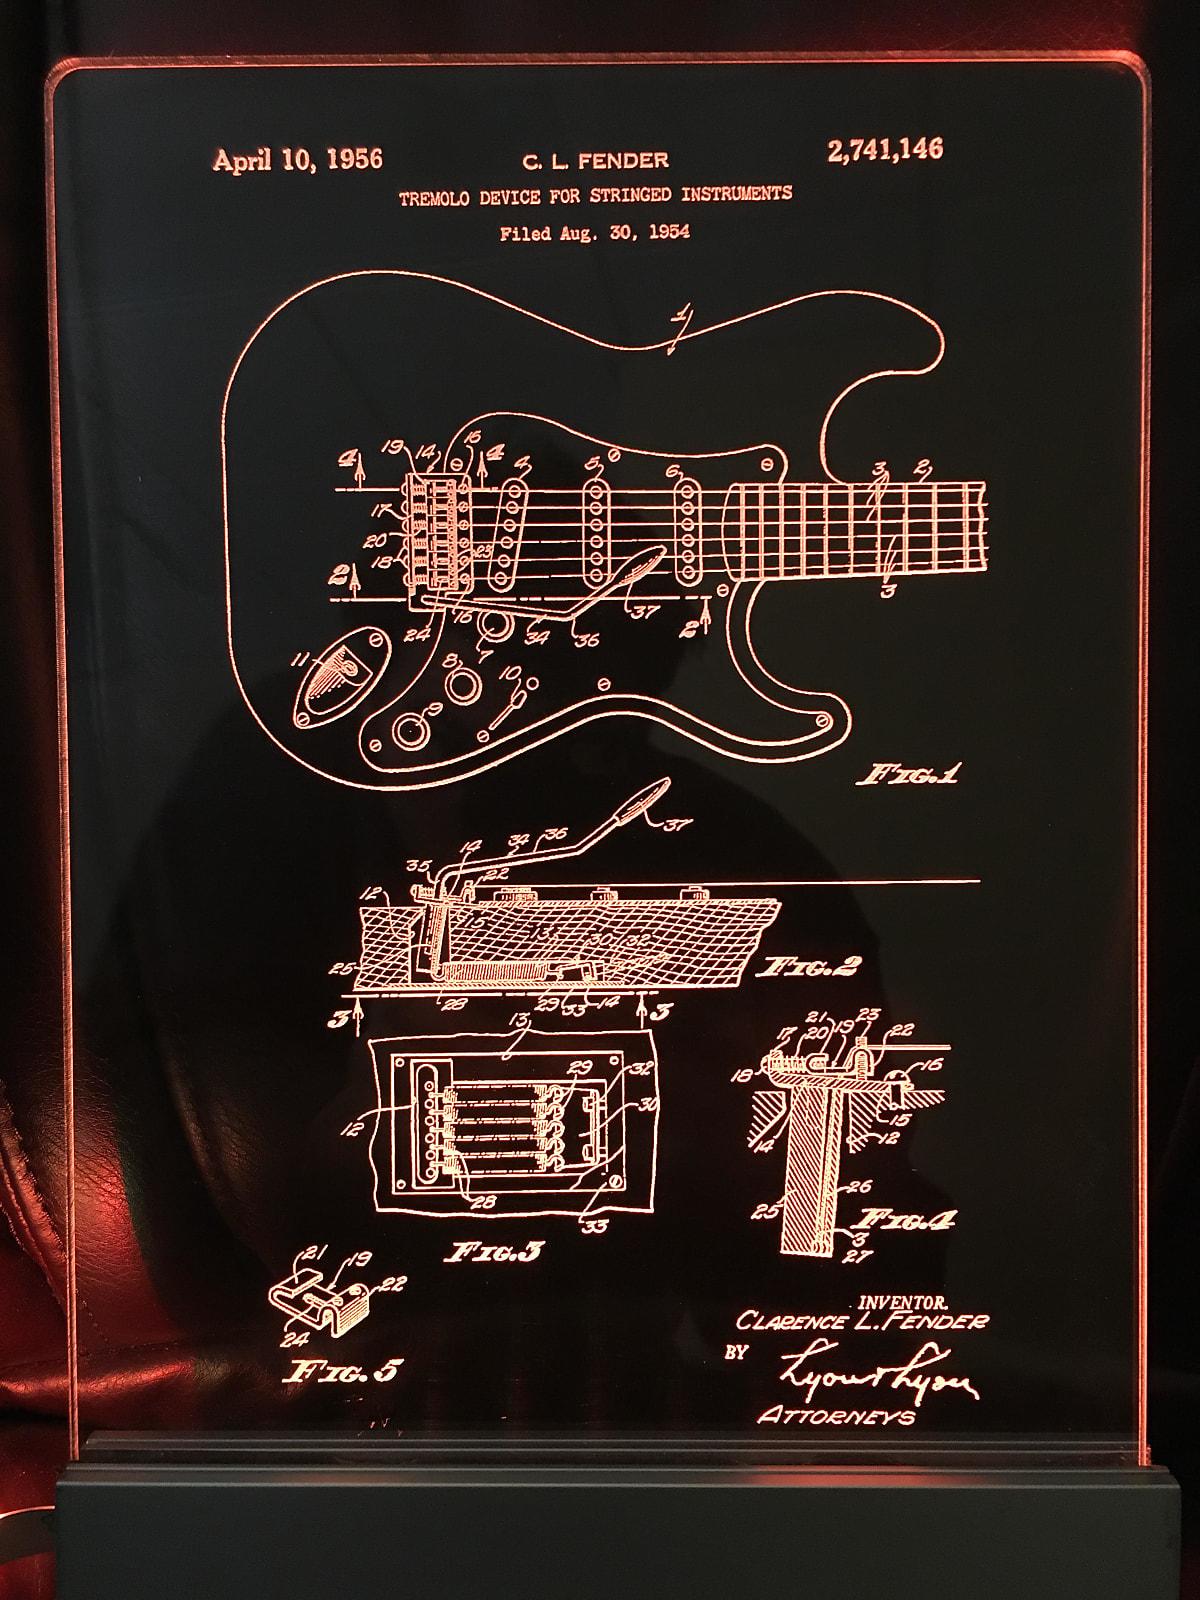 Fender Stratocaster Guitar Patent, Edge Lit Acrylic LED Sign Display, Laser  Engraved